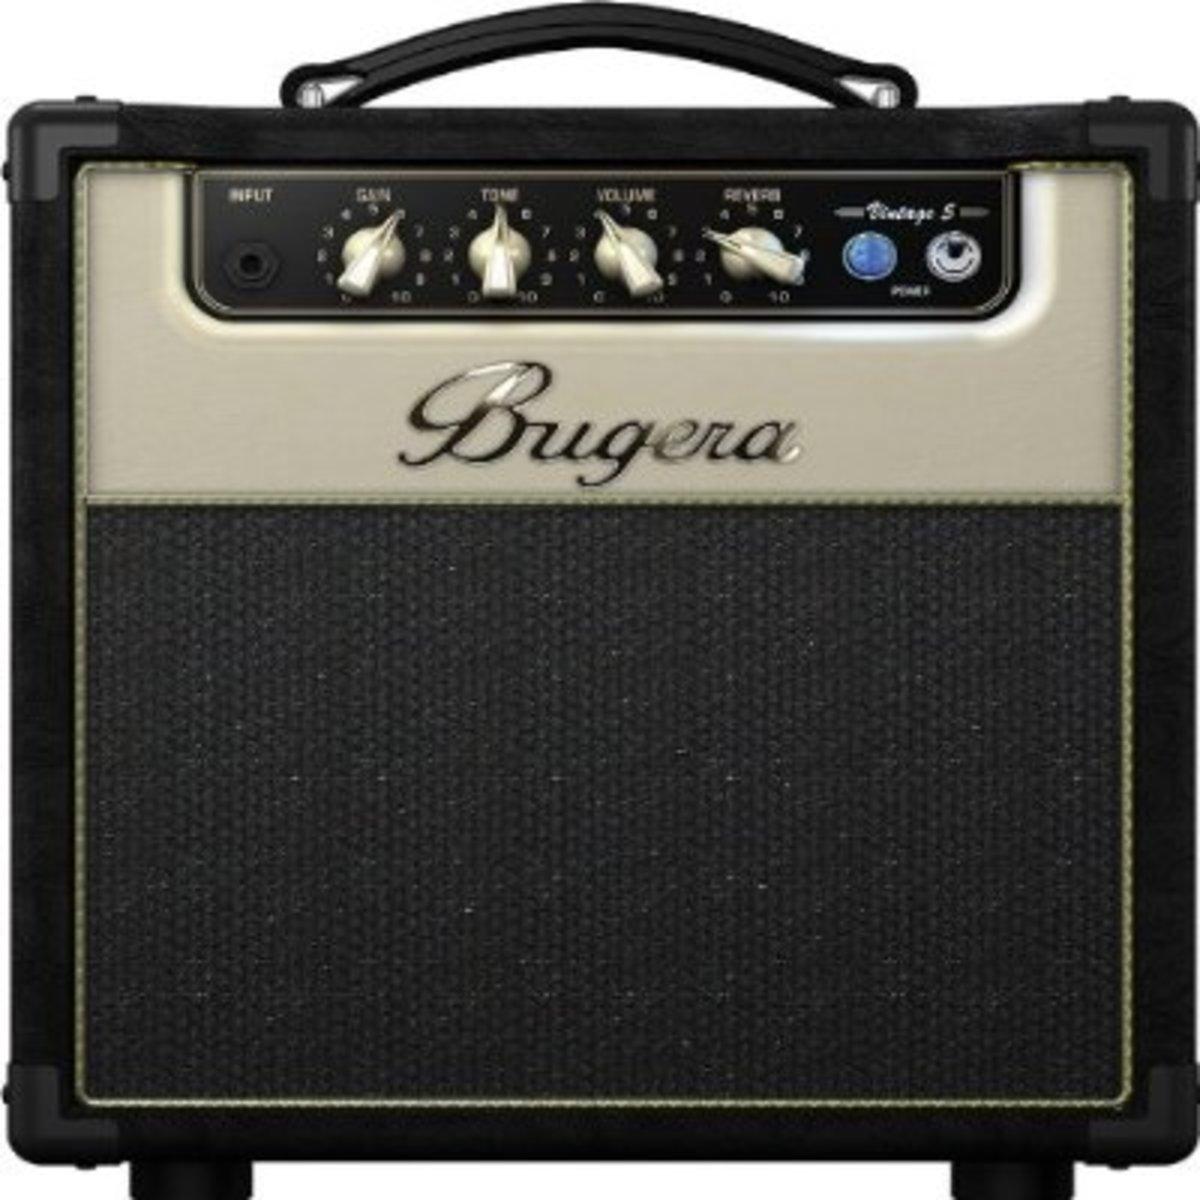 Bugera V5 Tube Amp: Best Cheap Valve Guitar Amps